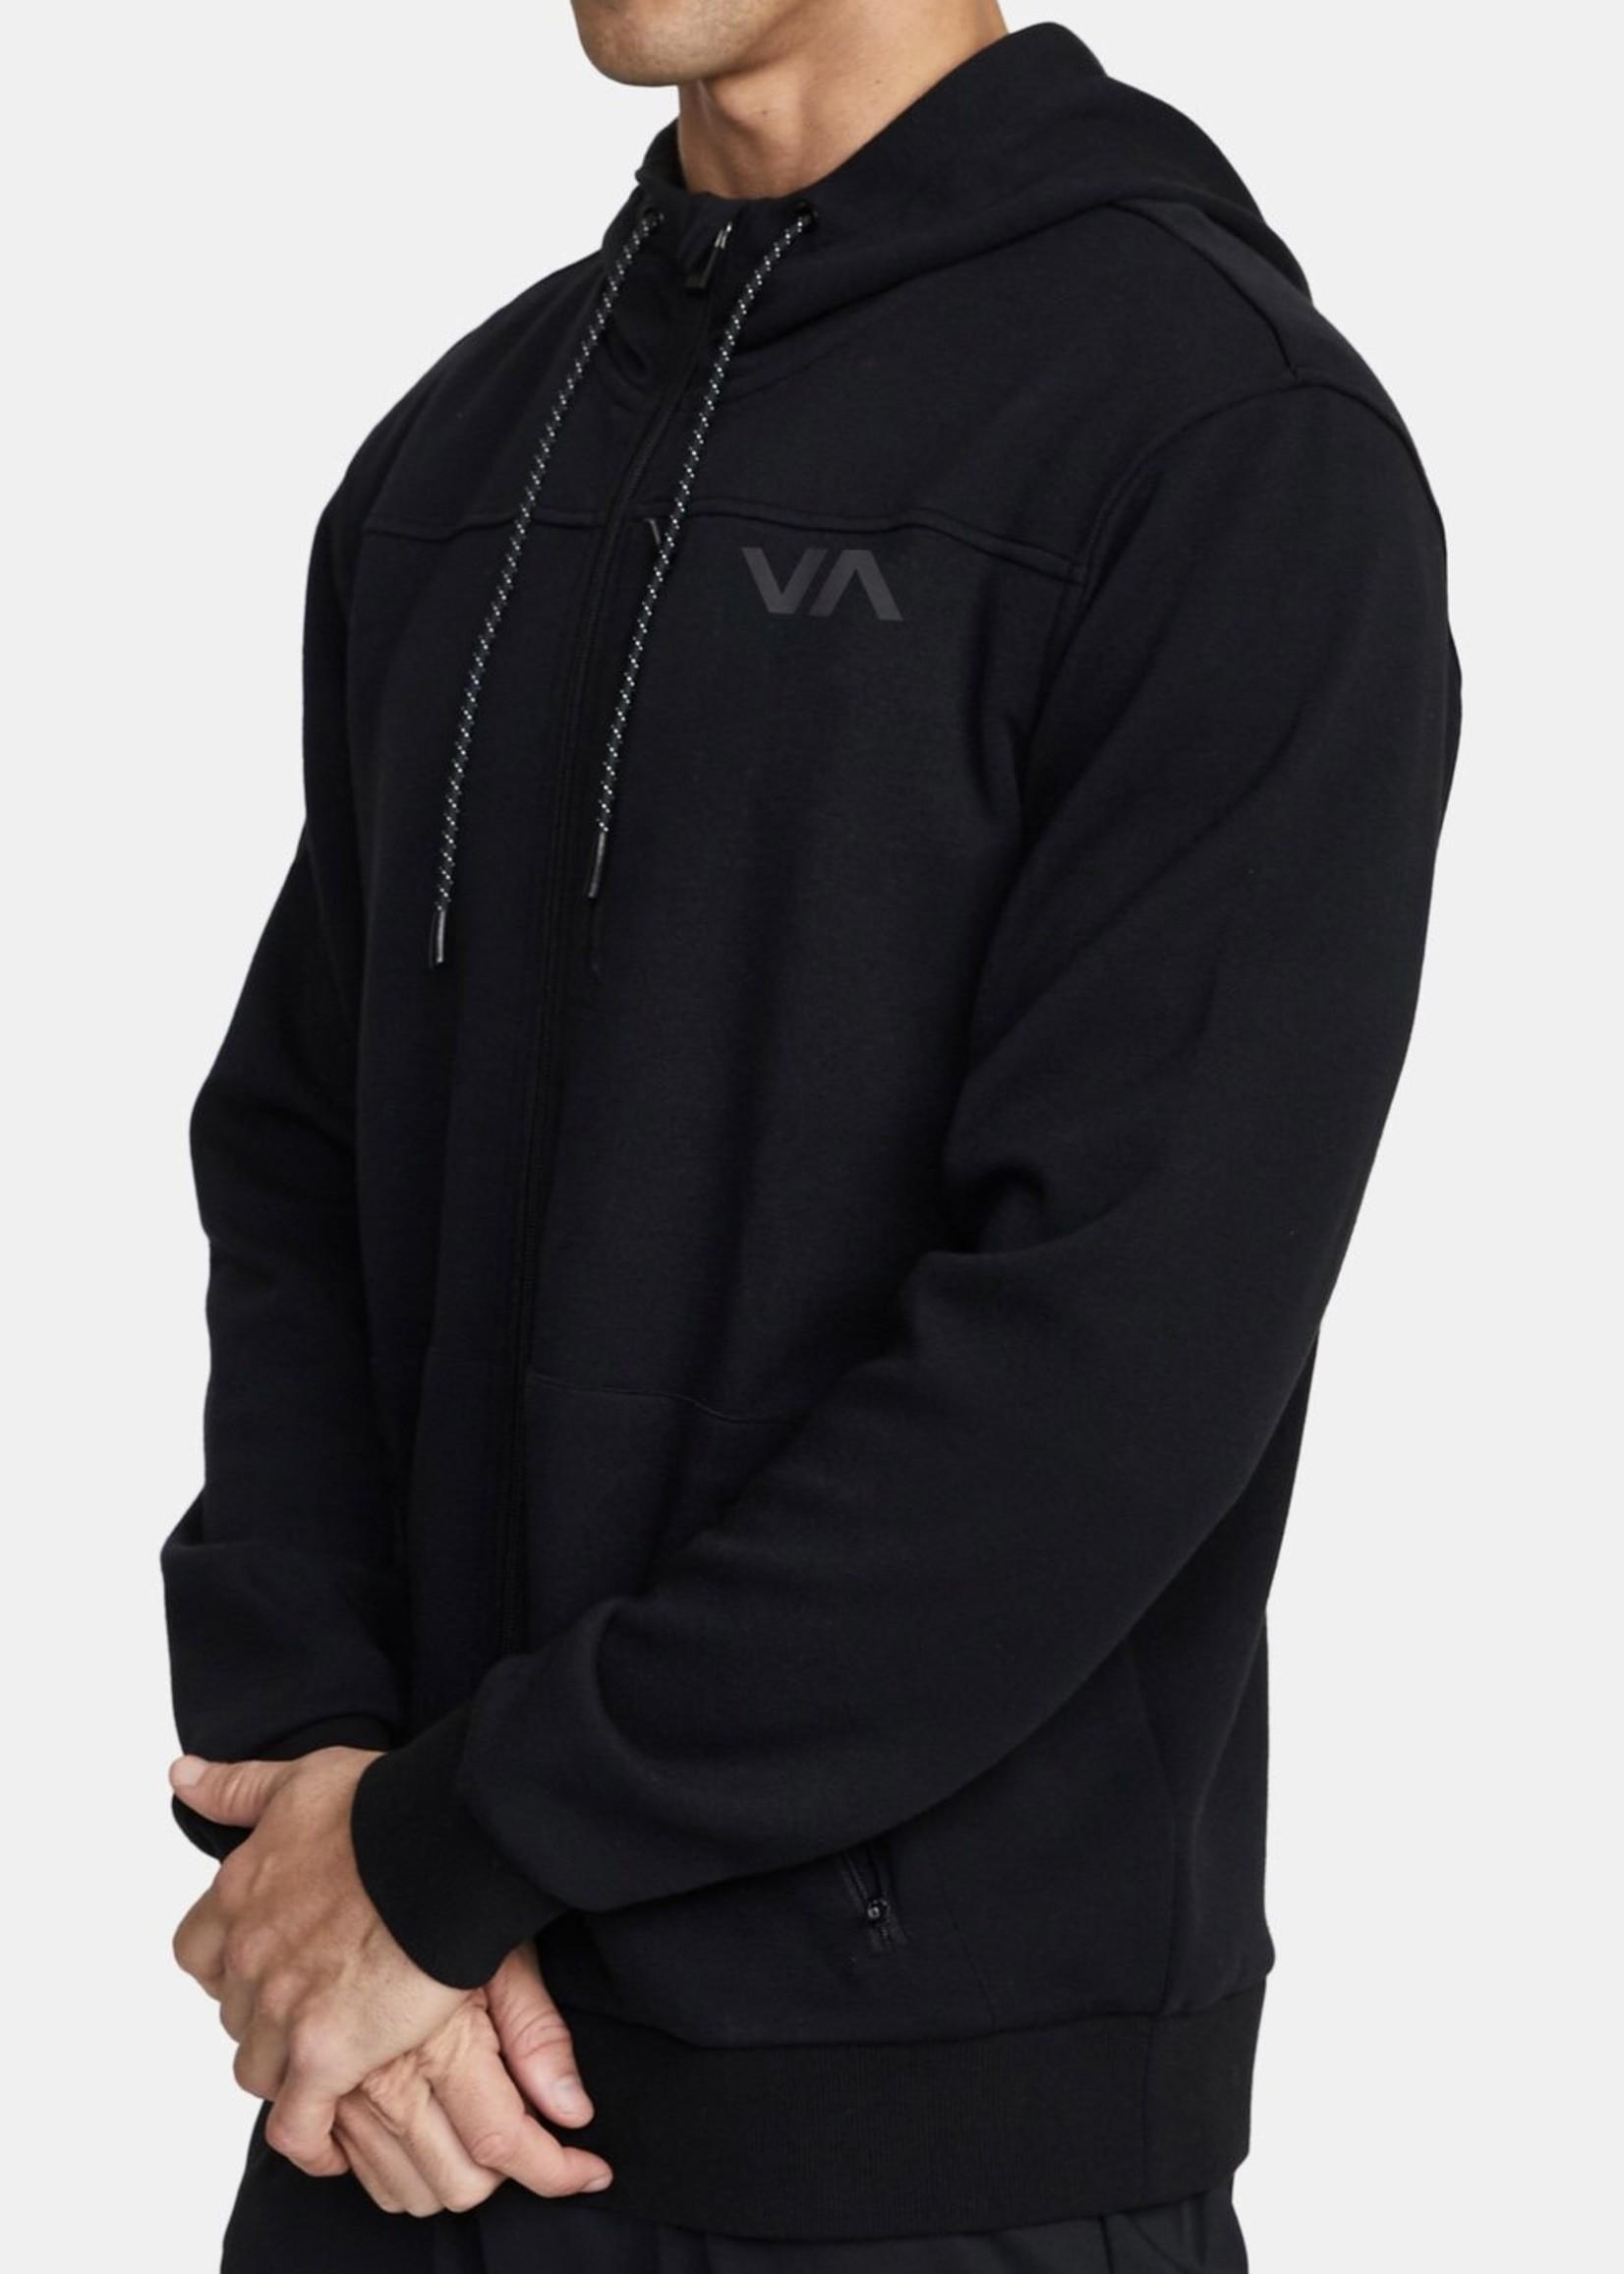 RVCA Sport Tech Hoodie